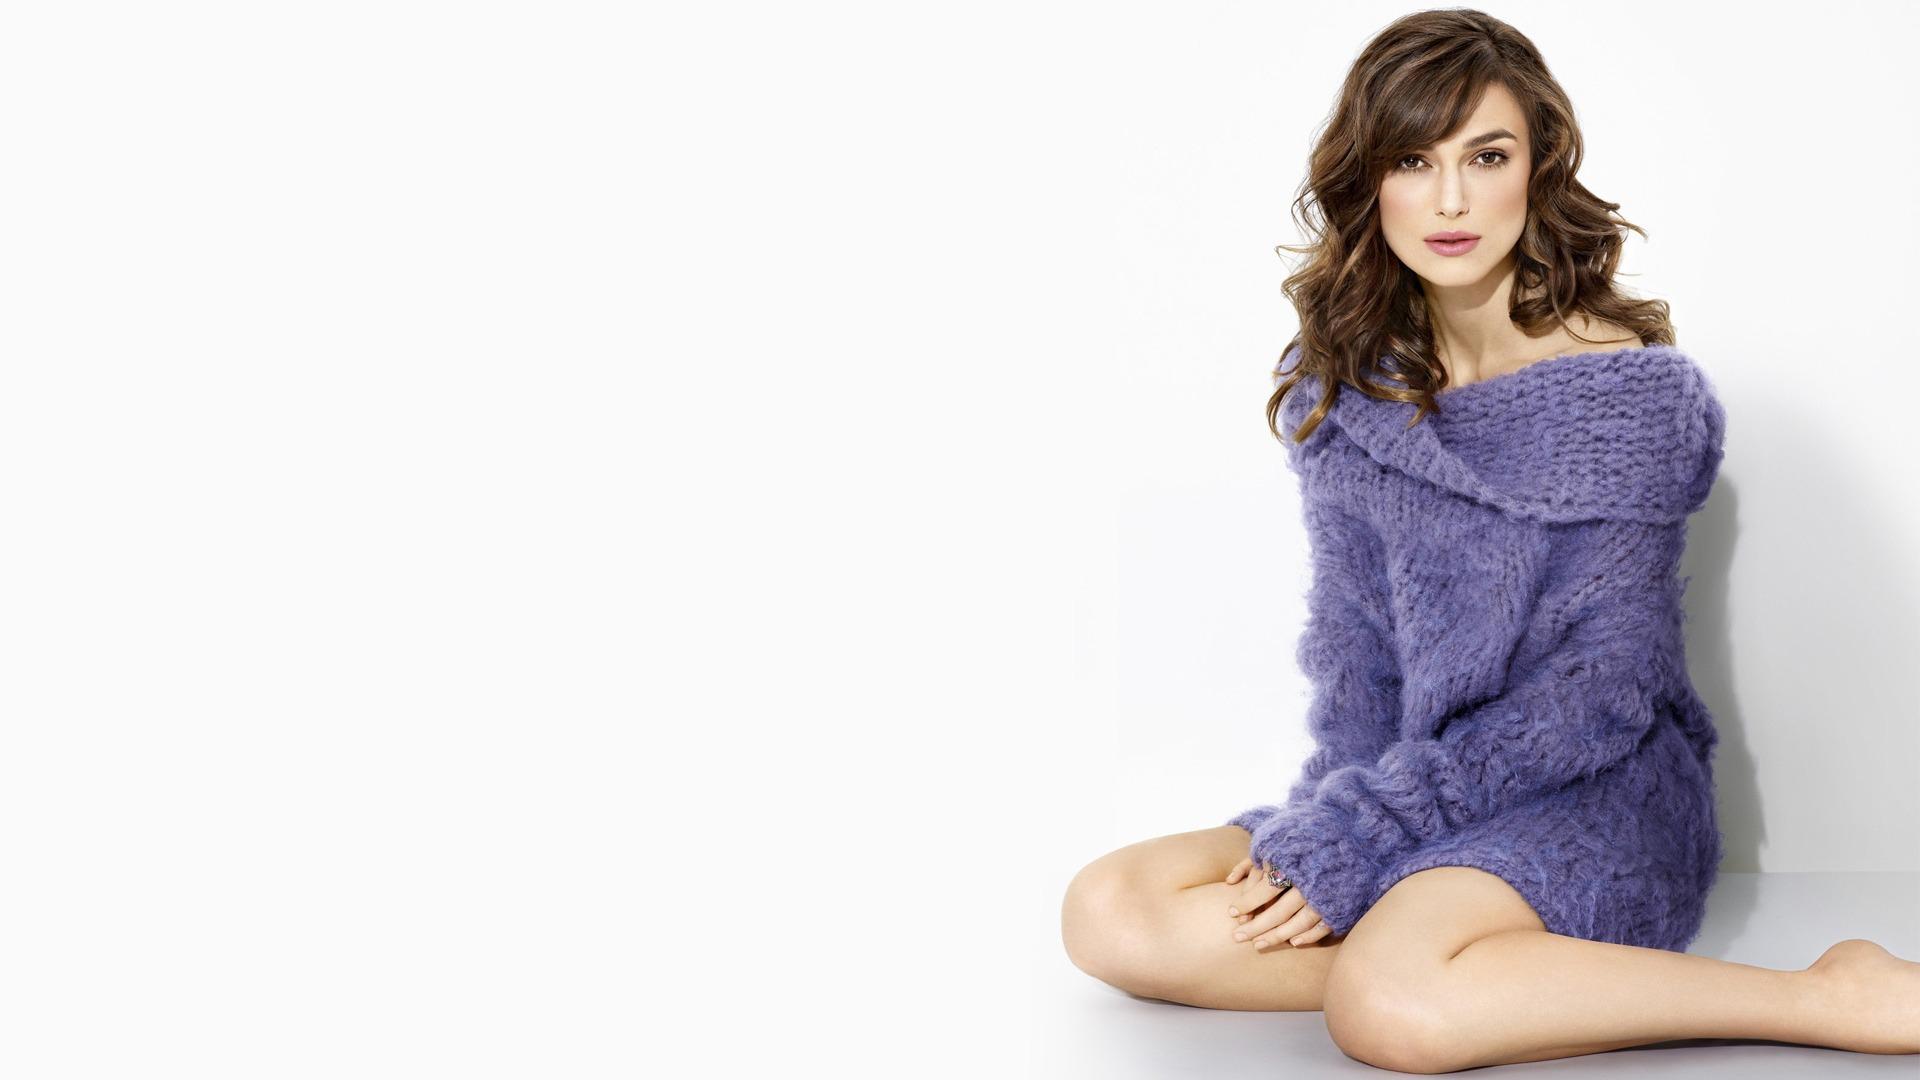 Célébrité - Keira Knightley  Fond d'écran